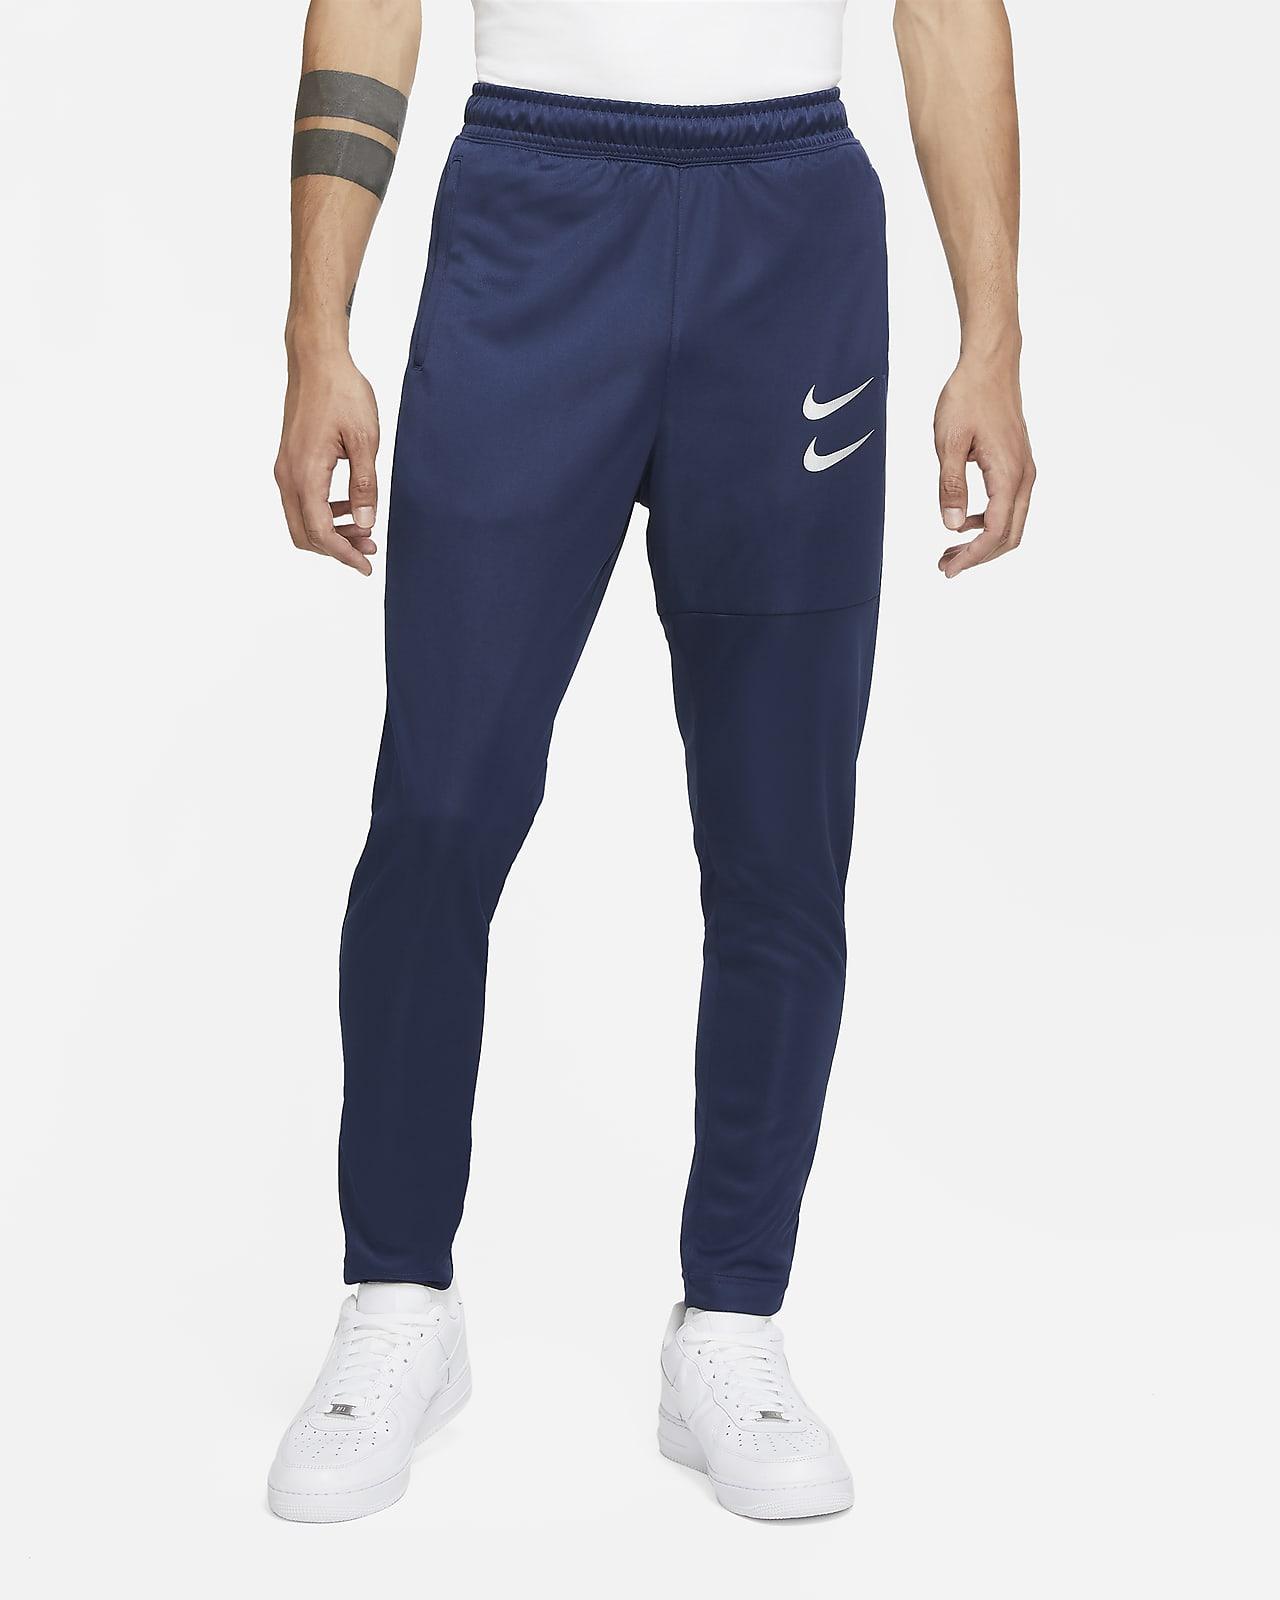 Pantaloni Nike Sportswear Swoosh - Uomo